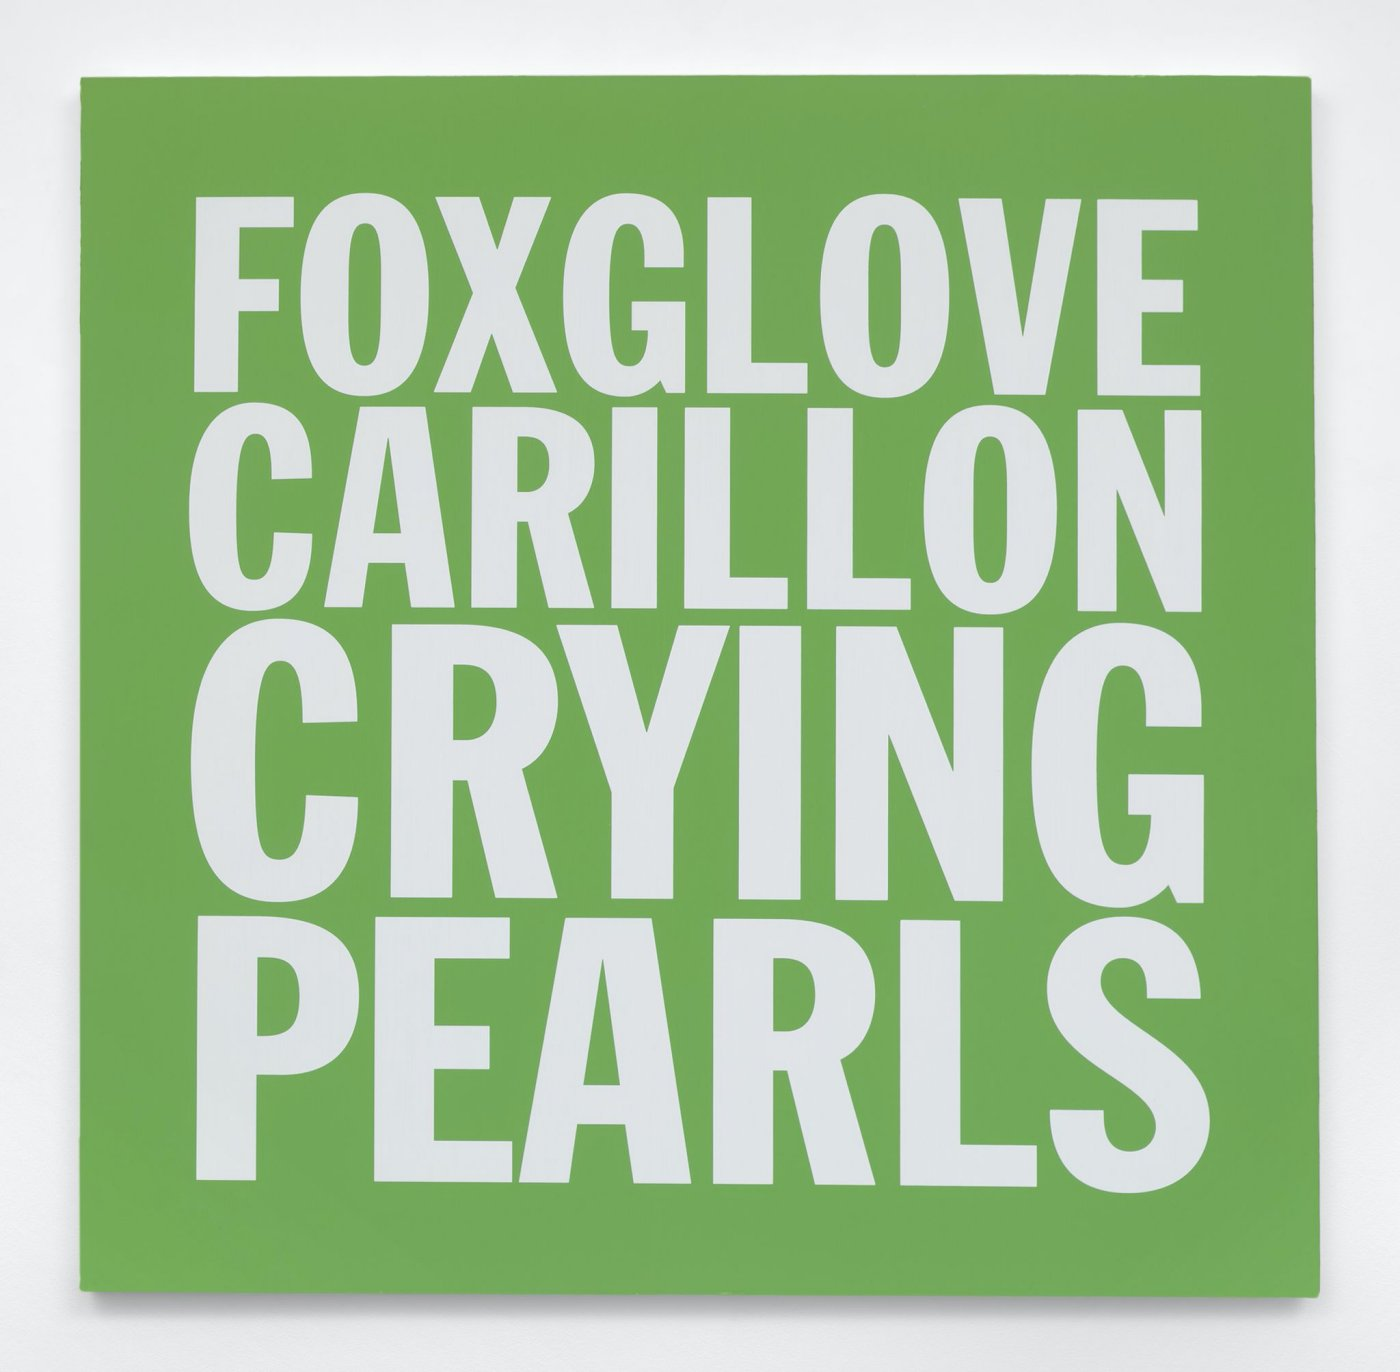 FOXGLOVE CARILLON CRYING PEARLS